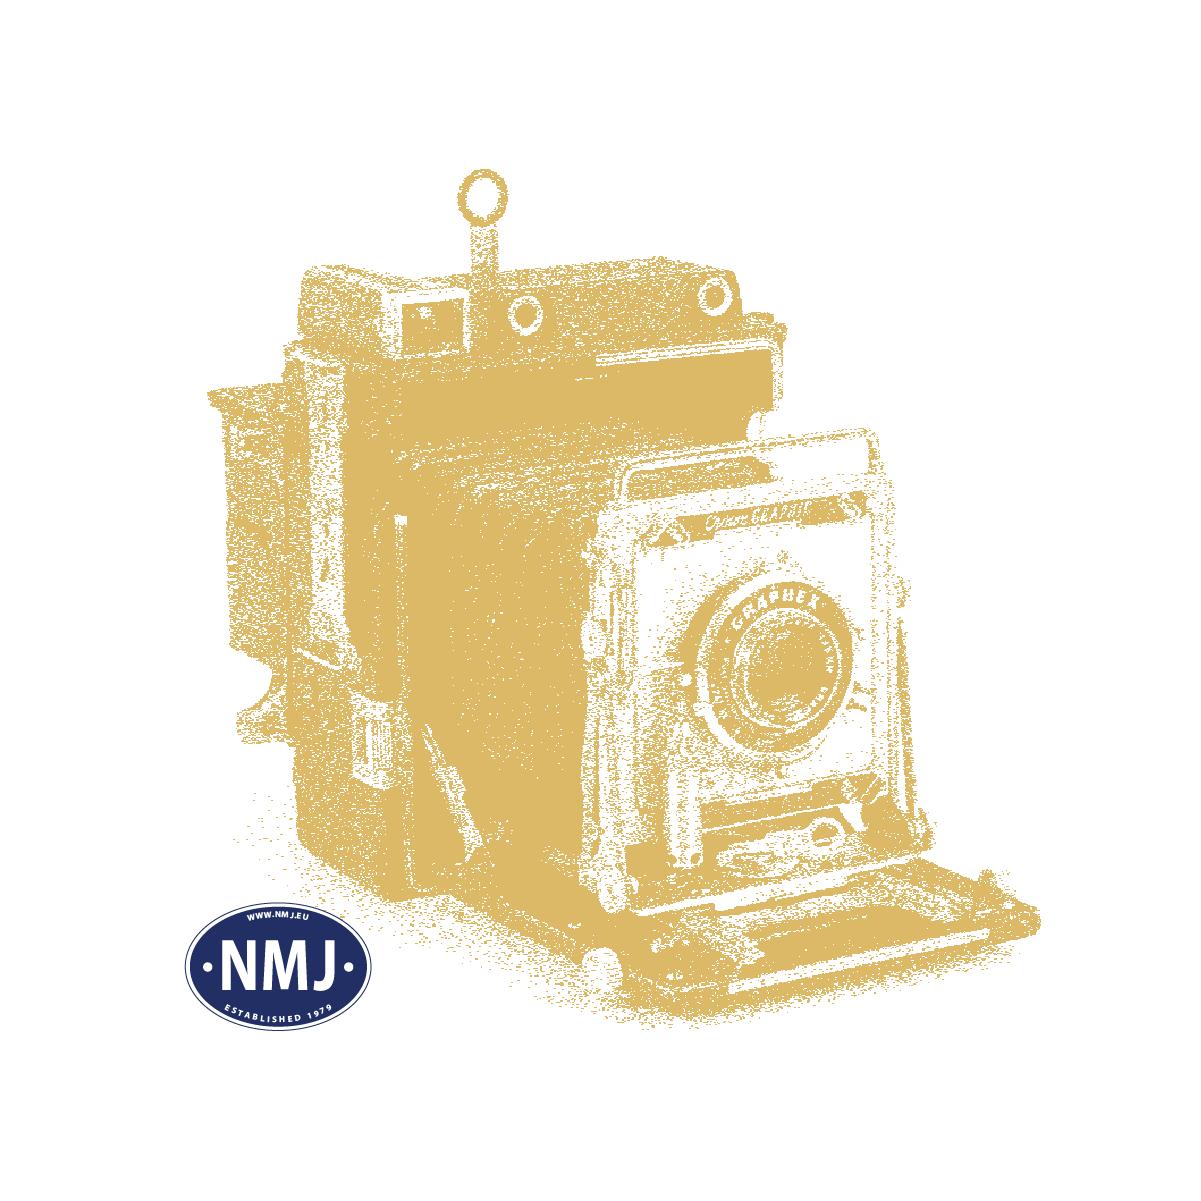 MWB-M003 - Gressmatte, Rough Medow, Sommer, 30 x 21 Cm